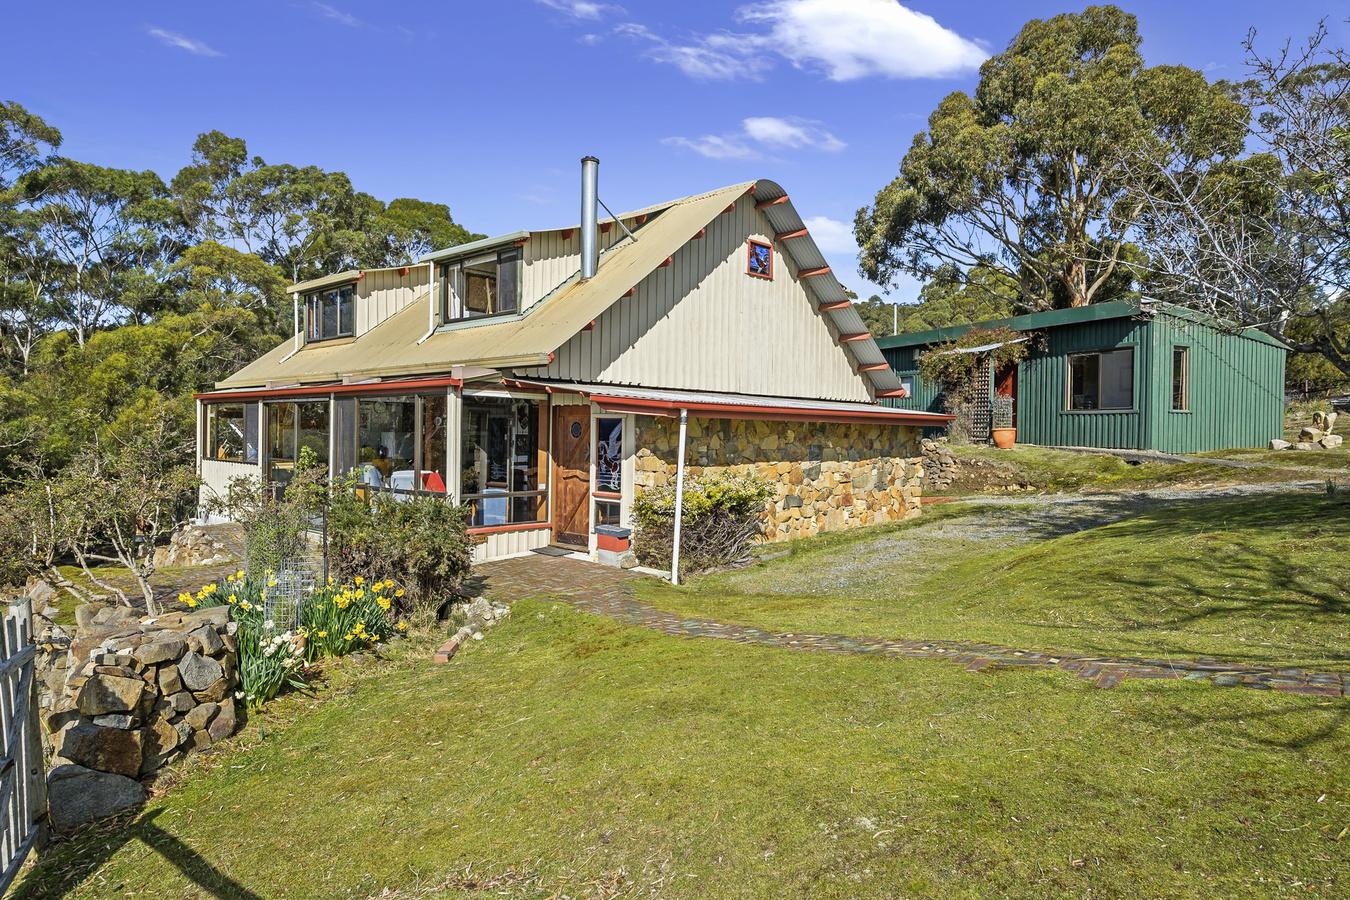 115 Old Bernies Road Margate 7054 Australia